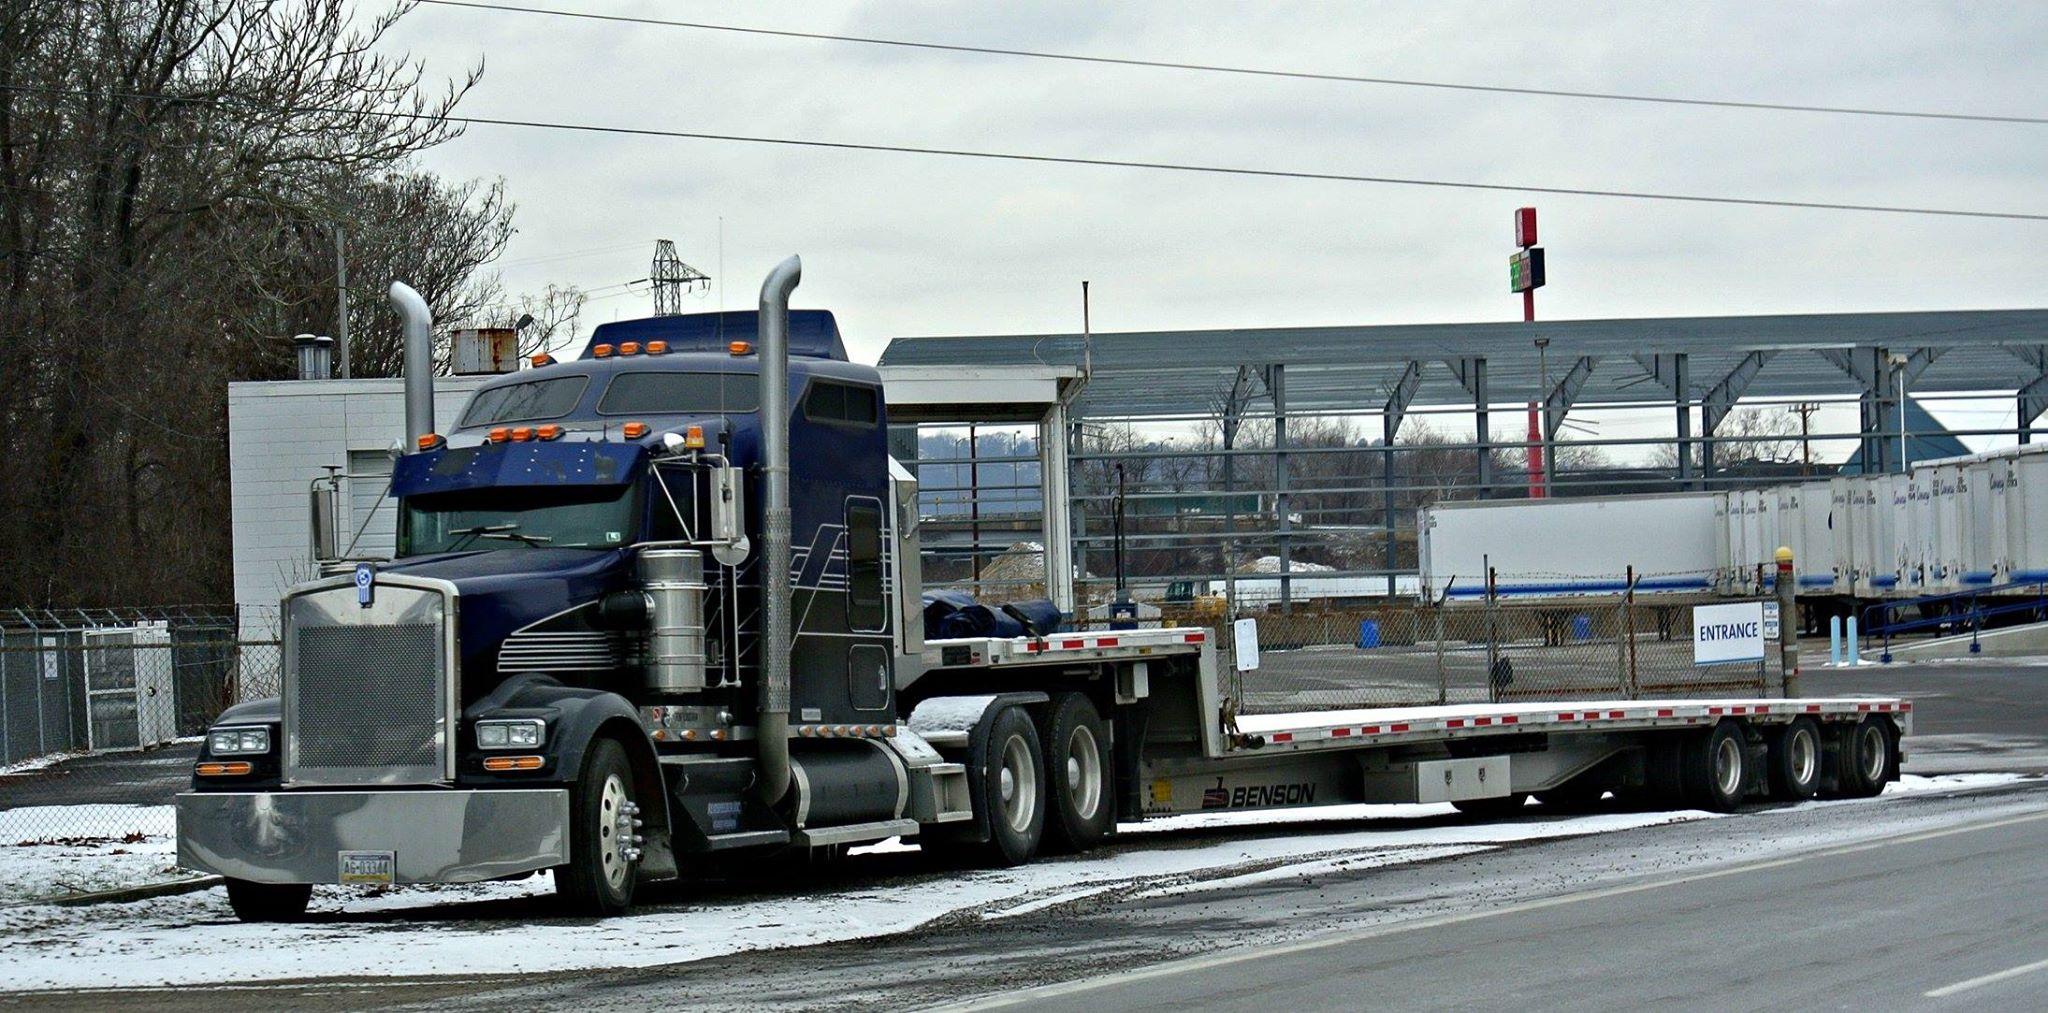 американский город и грузовик